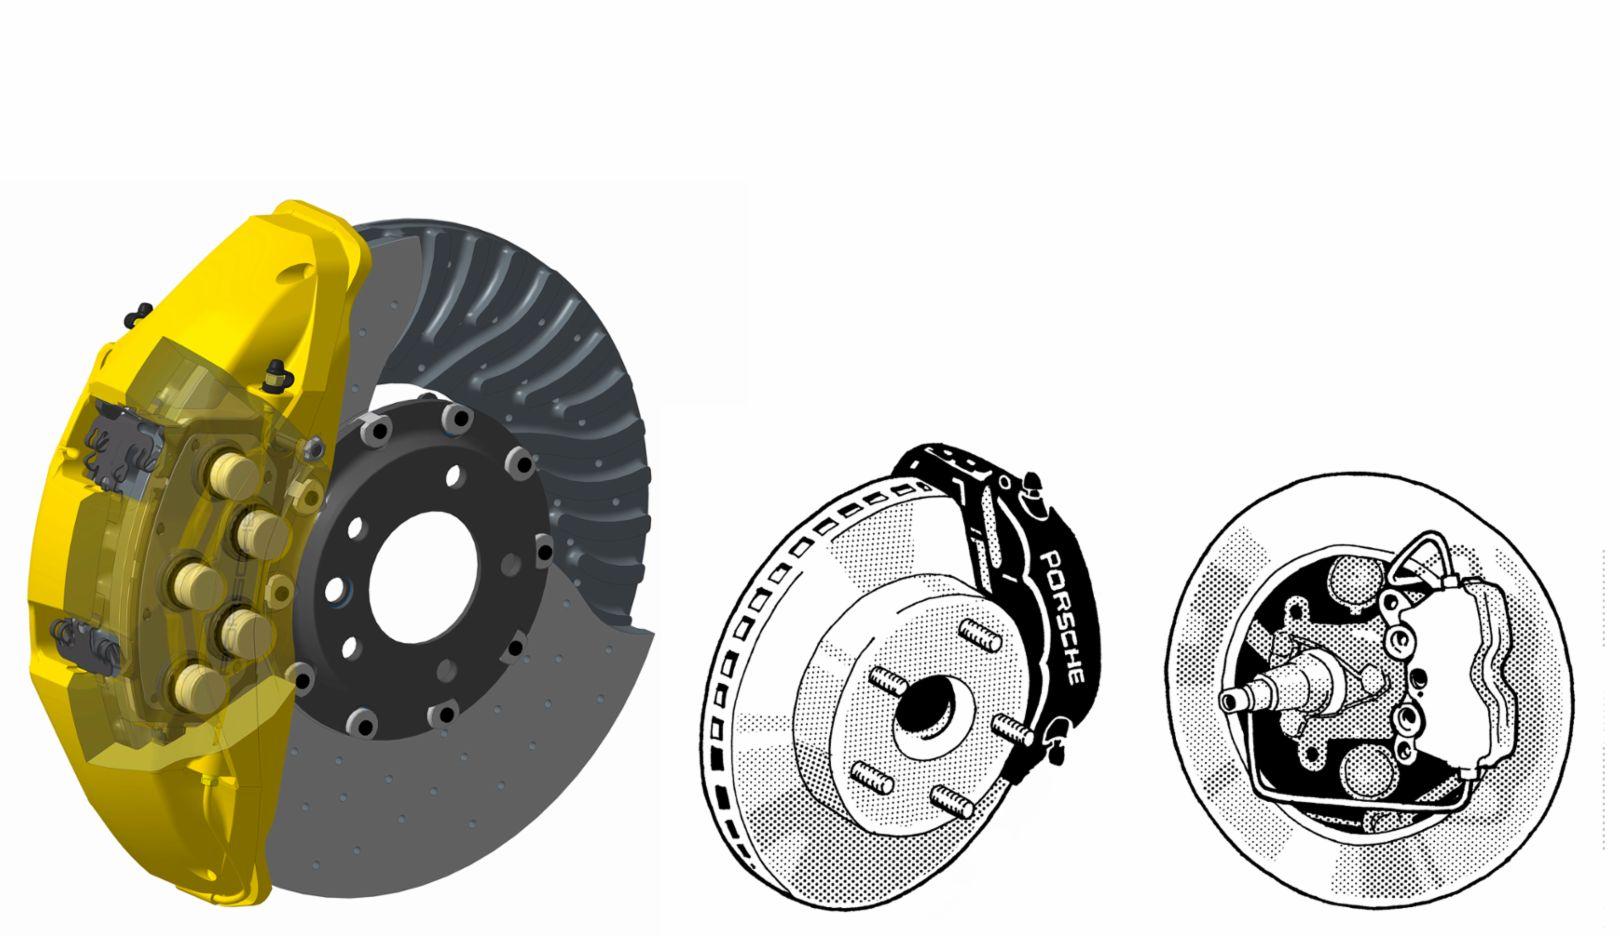 Ten-piston brake calipers, Anti-lock brakes (ABS), Annular disc brakes, 2015, 1983, 1962, Porsche AG